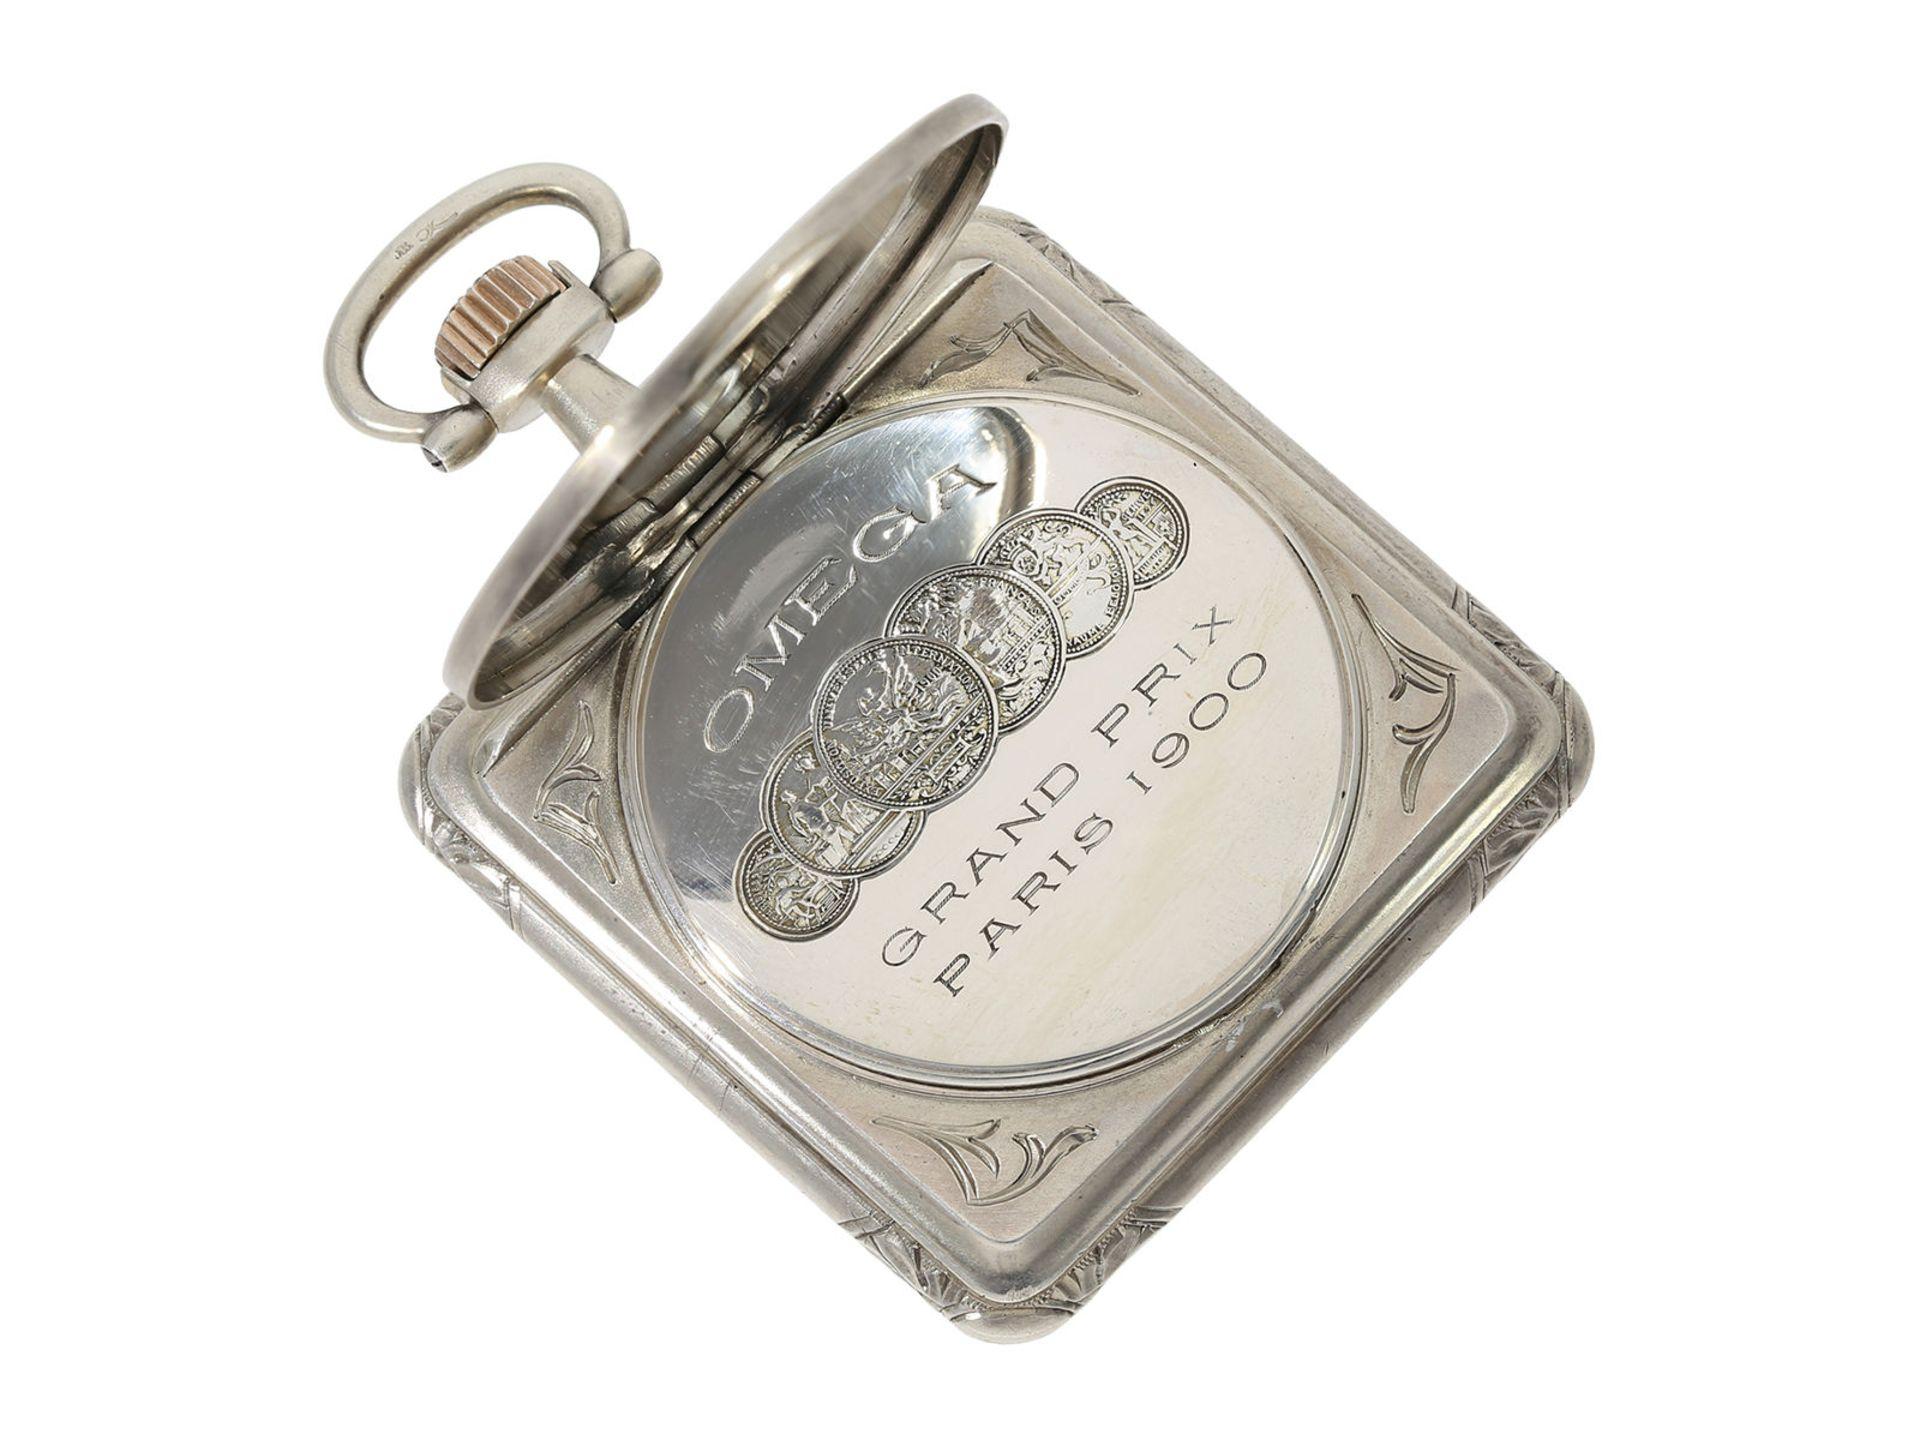 Pocket watch: very rare square Art Nouveau Omega pocket watch, silver, ca. 1900 - Bild 3 aus 5